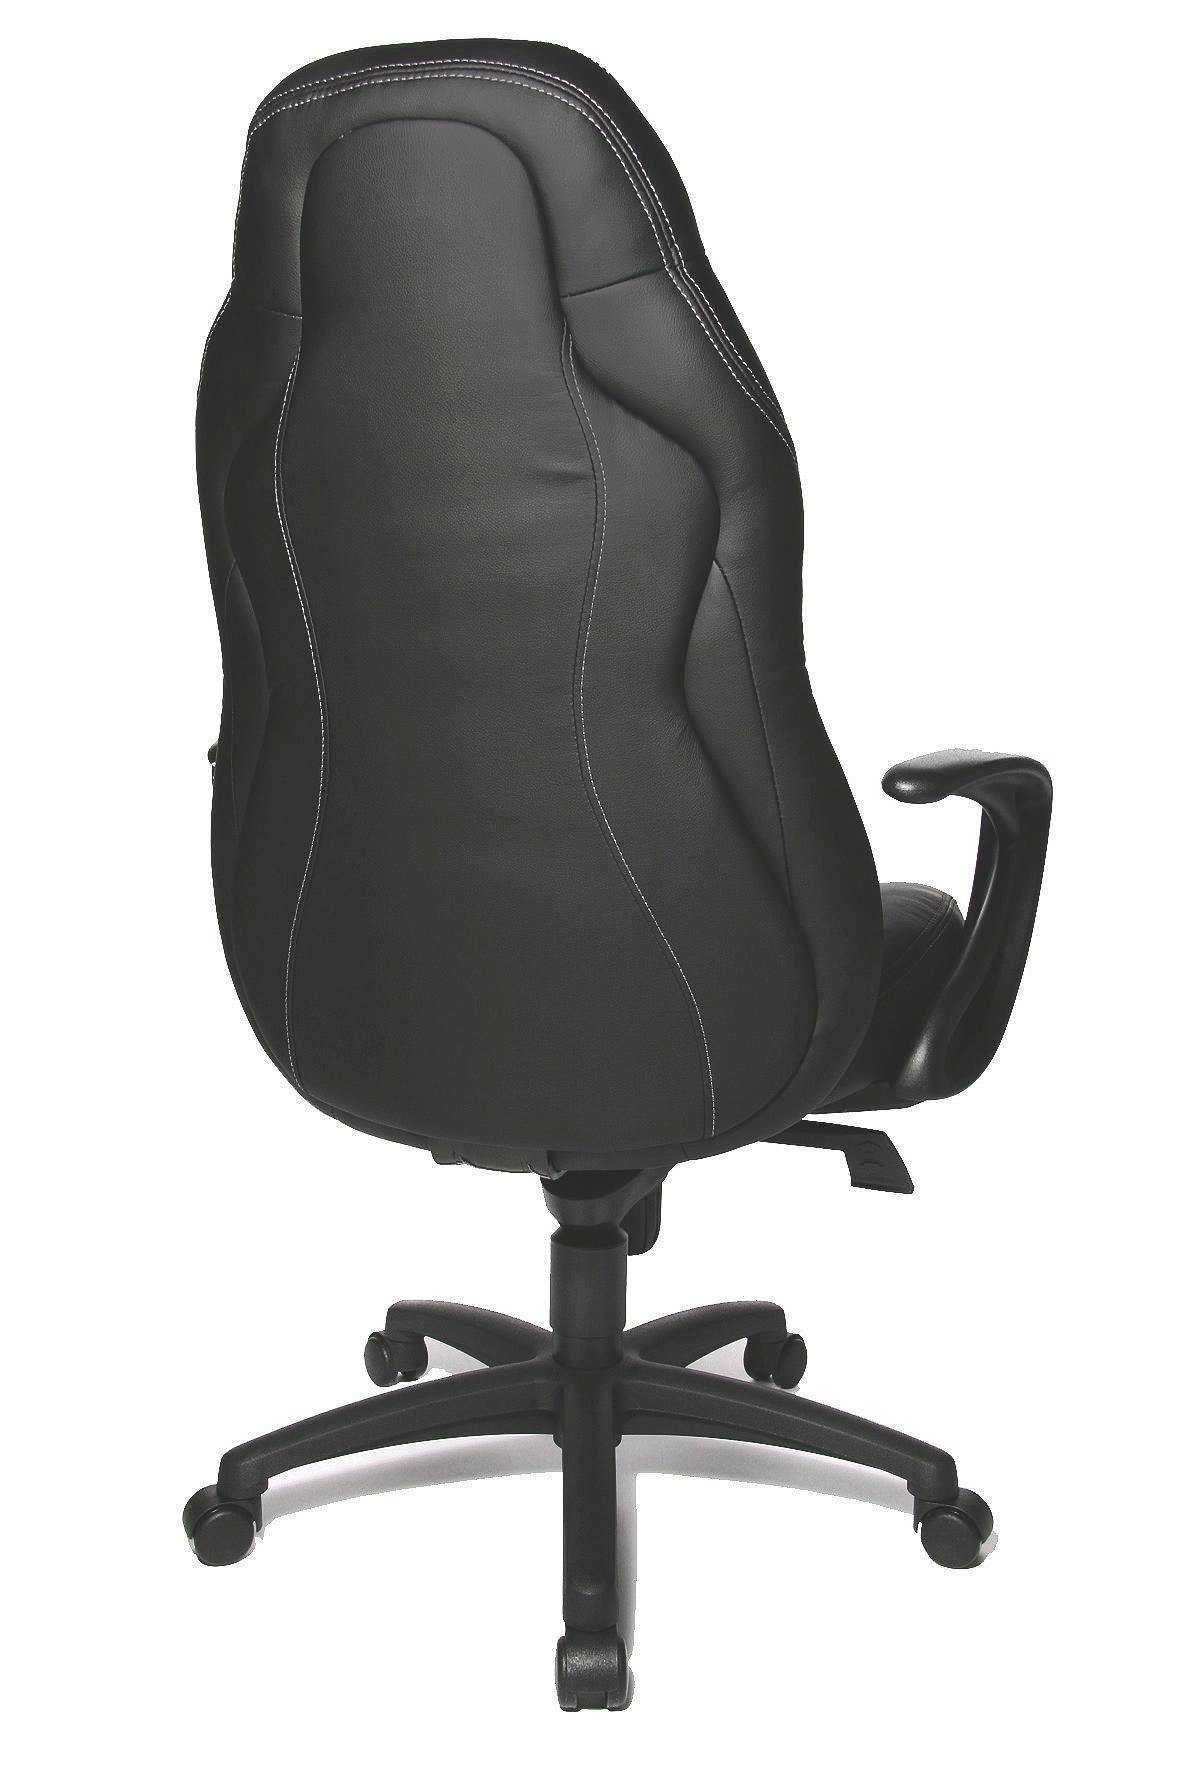 CHEFSESSEL Grau, Schwarz - Schwarz/Grau, Basics, Kunststoff/Textil